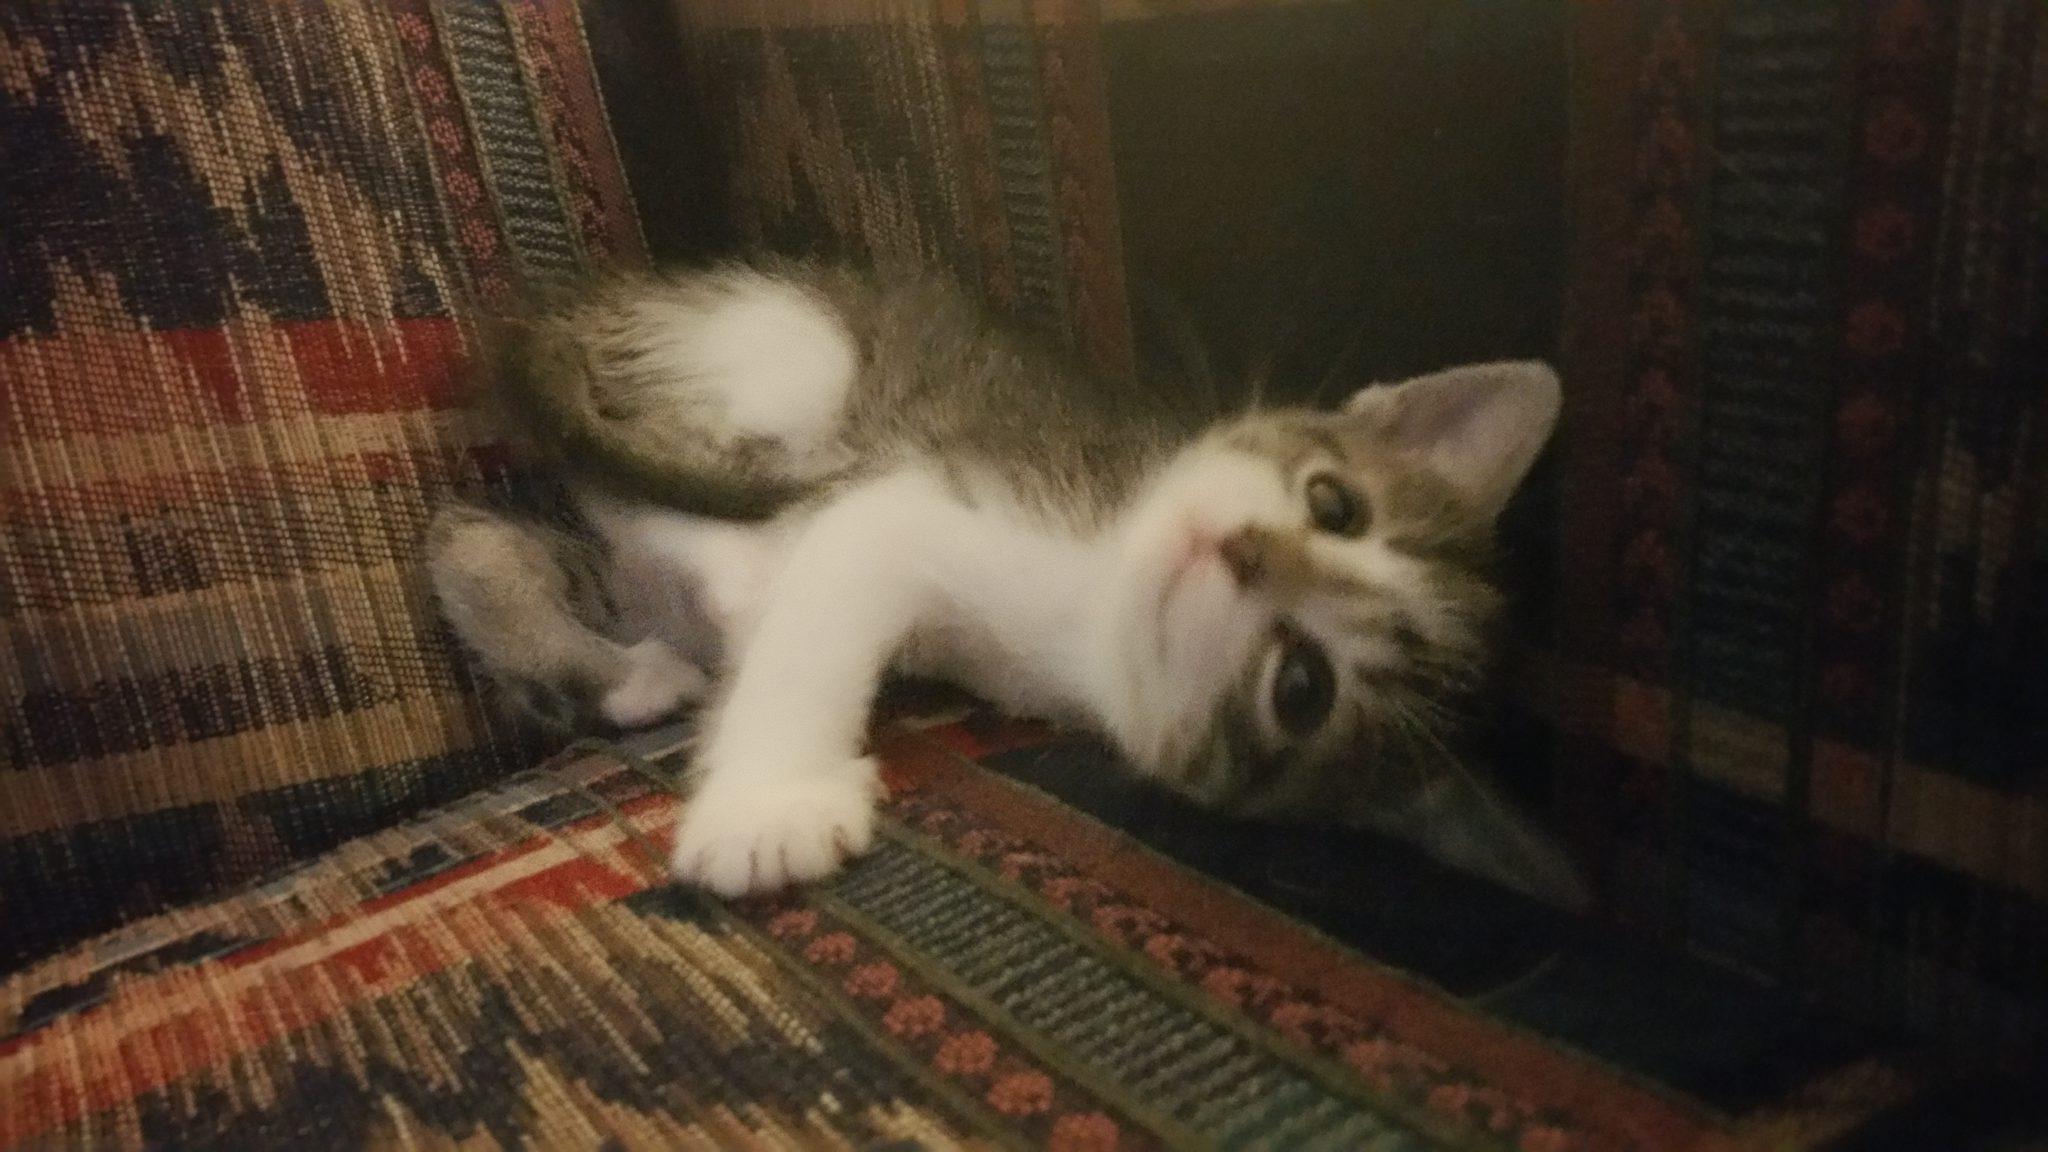 Kipper the Kitty